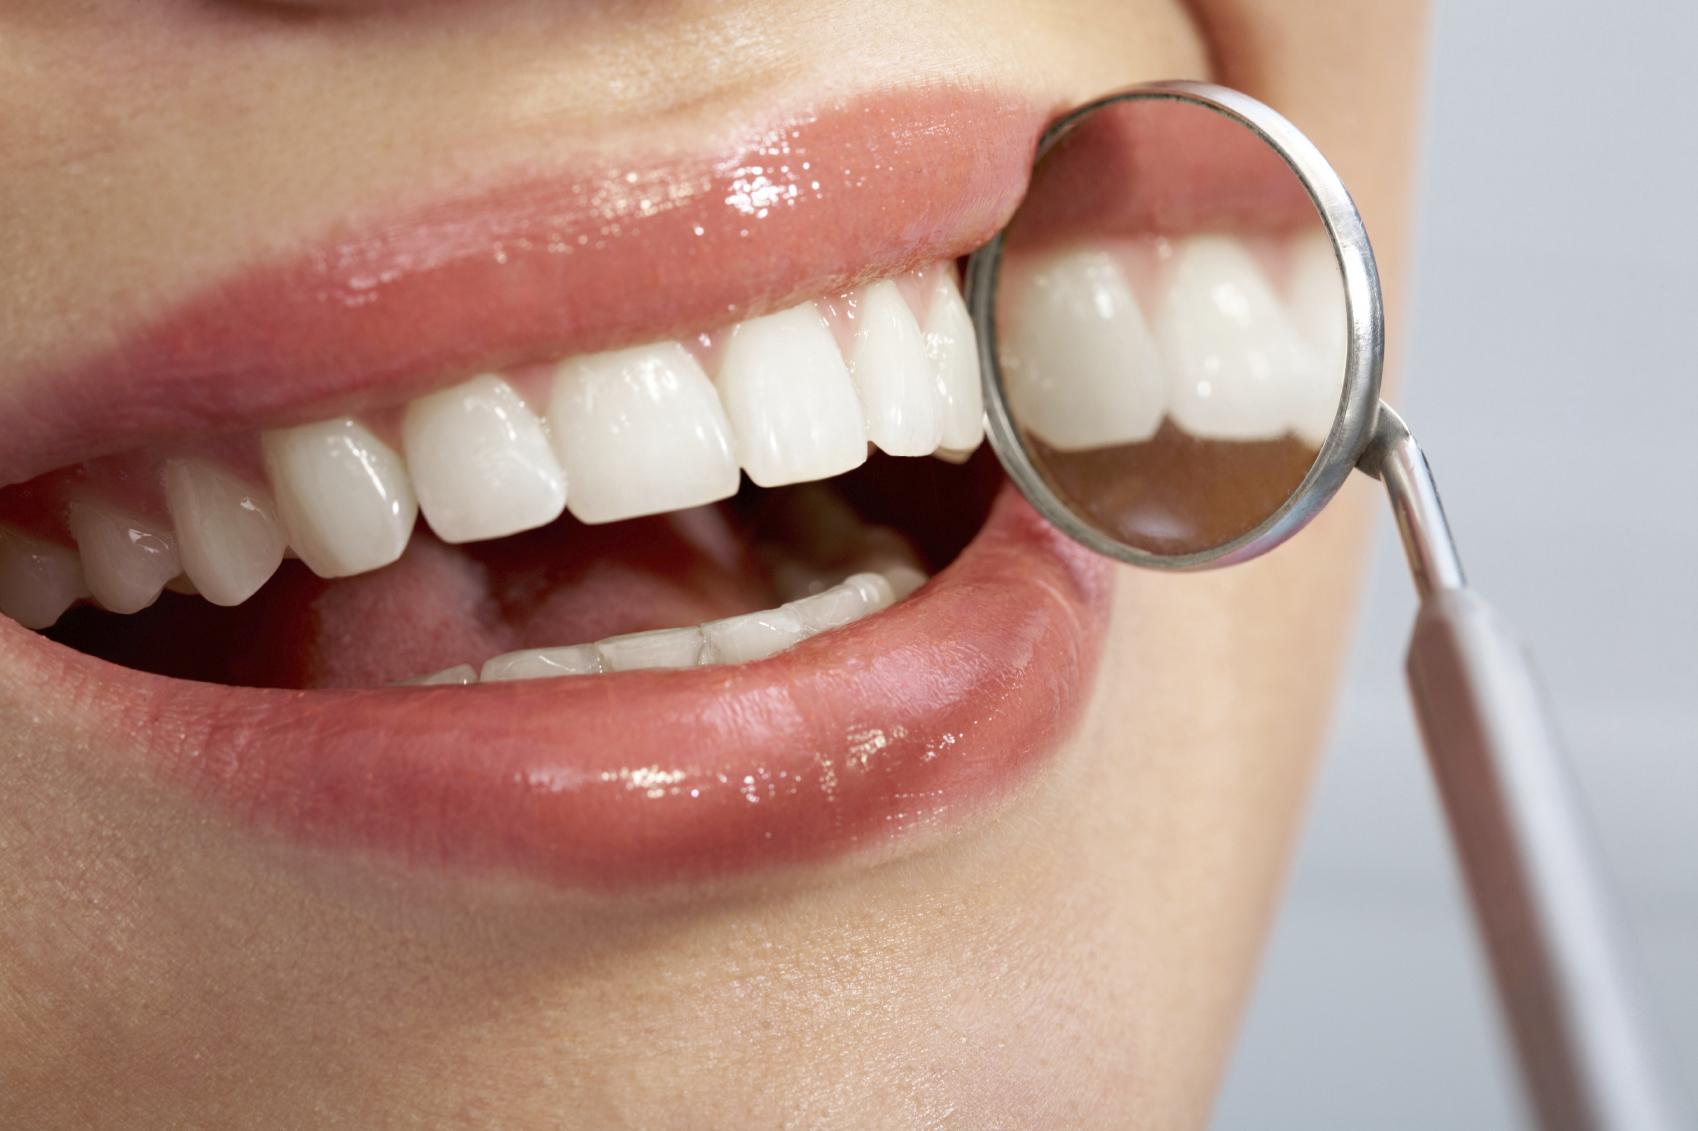 3M ESPE Rides the Success of Composite Dental Restorative